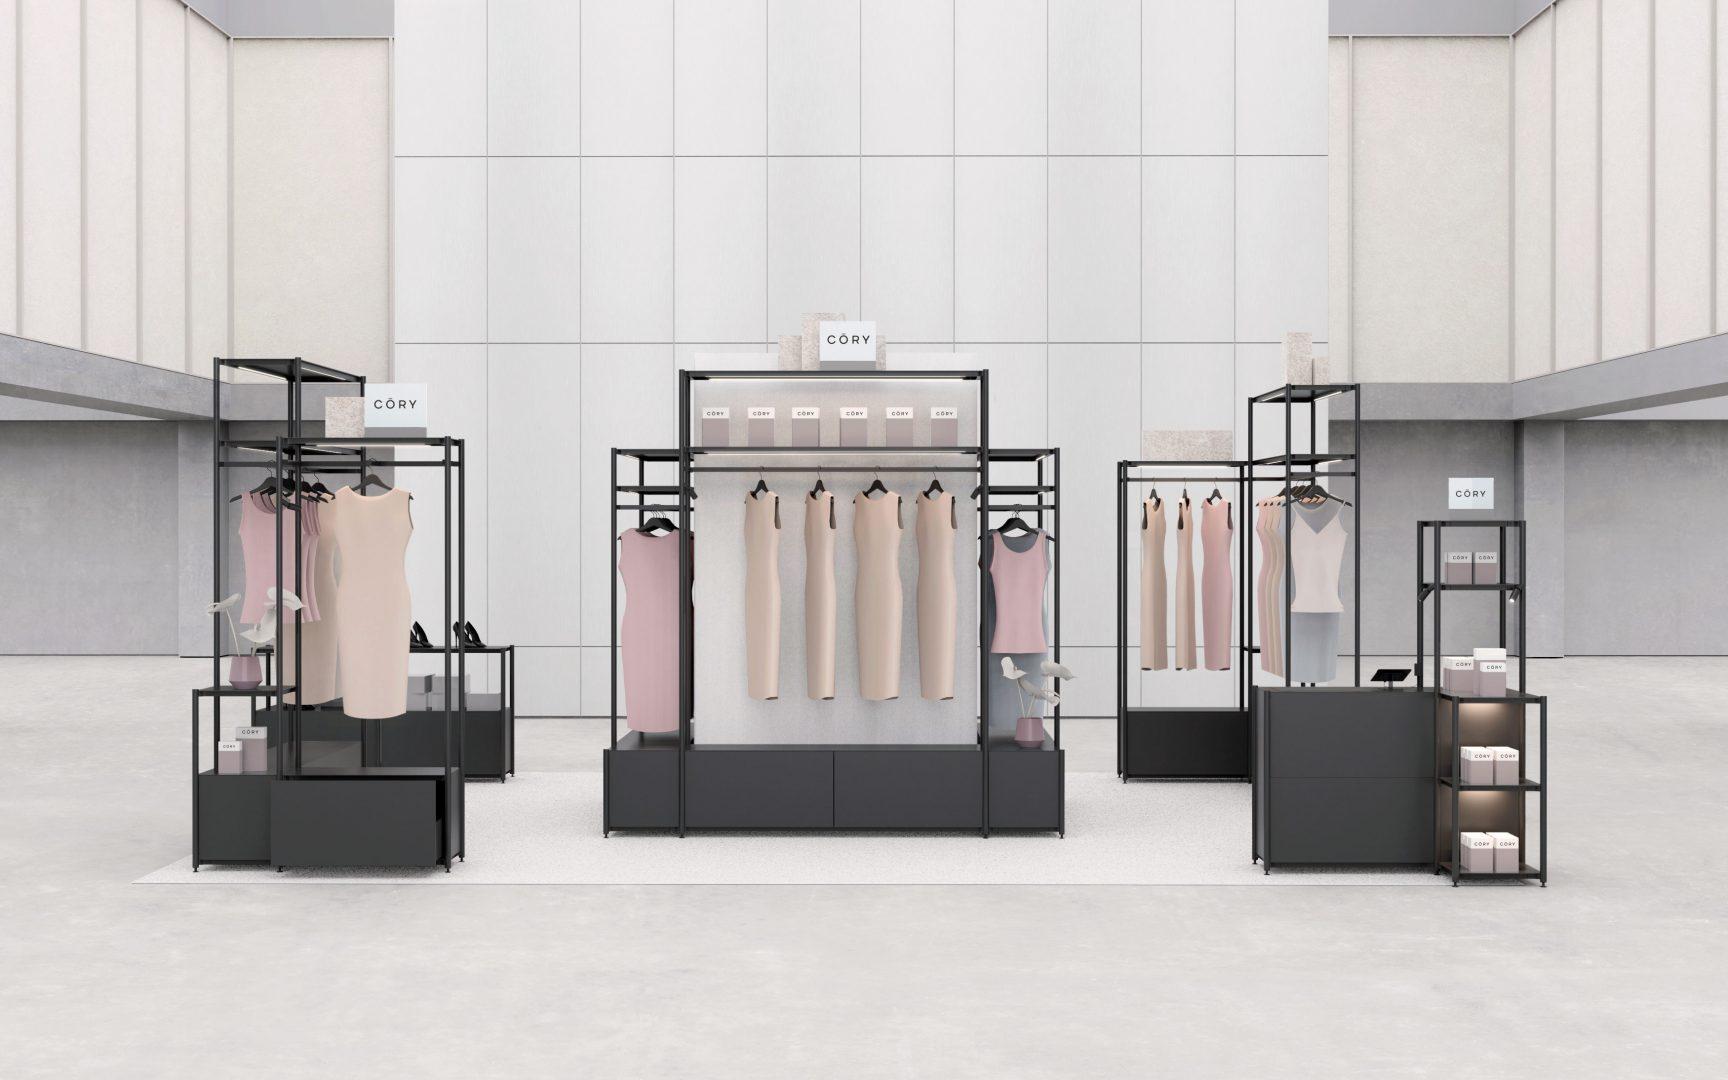 atelier-522-omnio-boutique-pop-up-perspektive